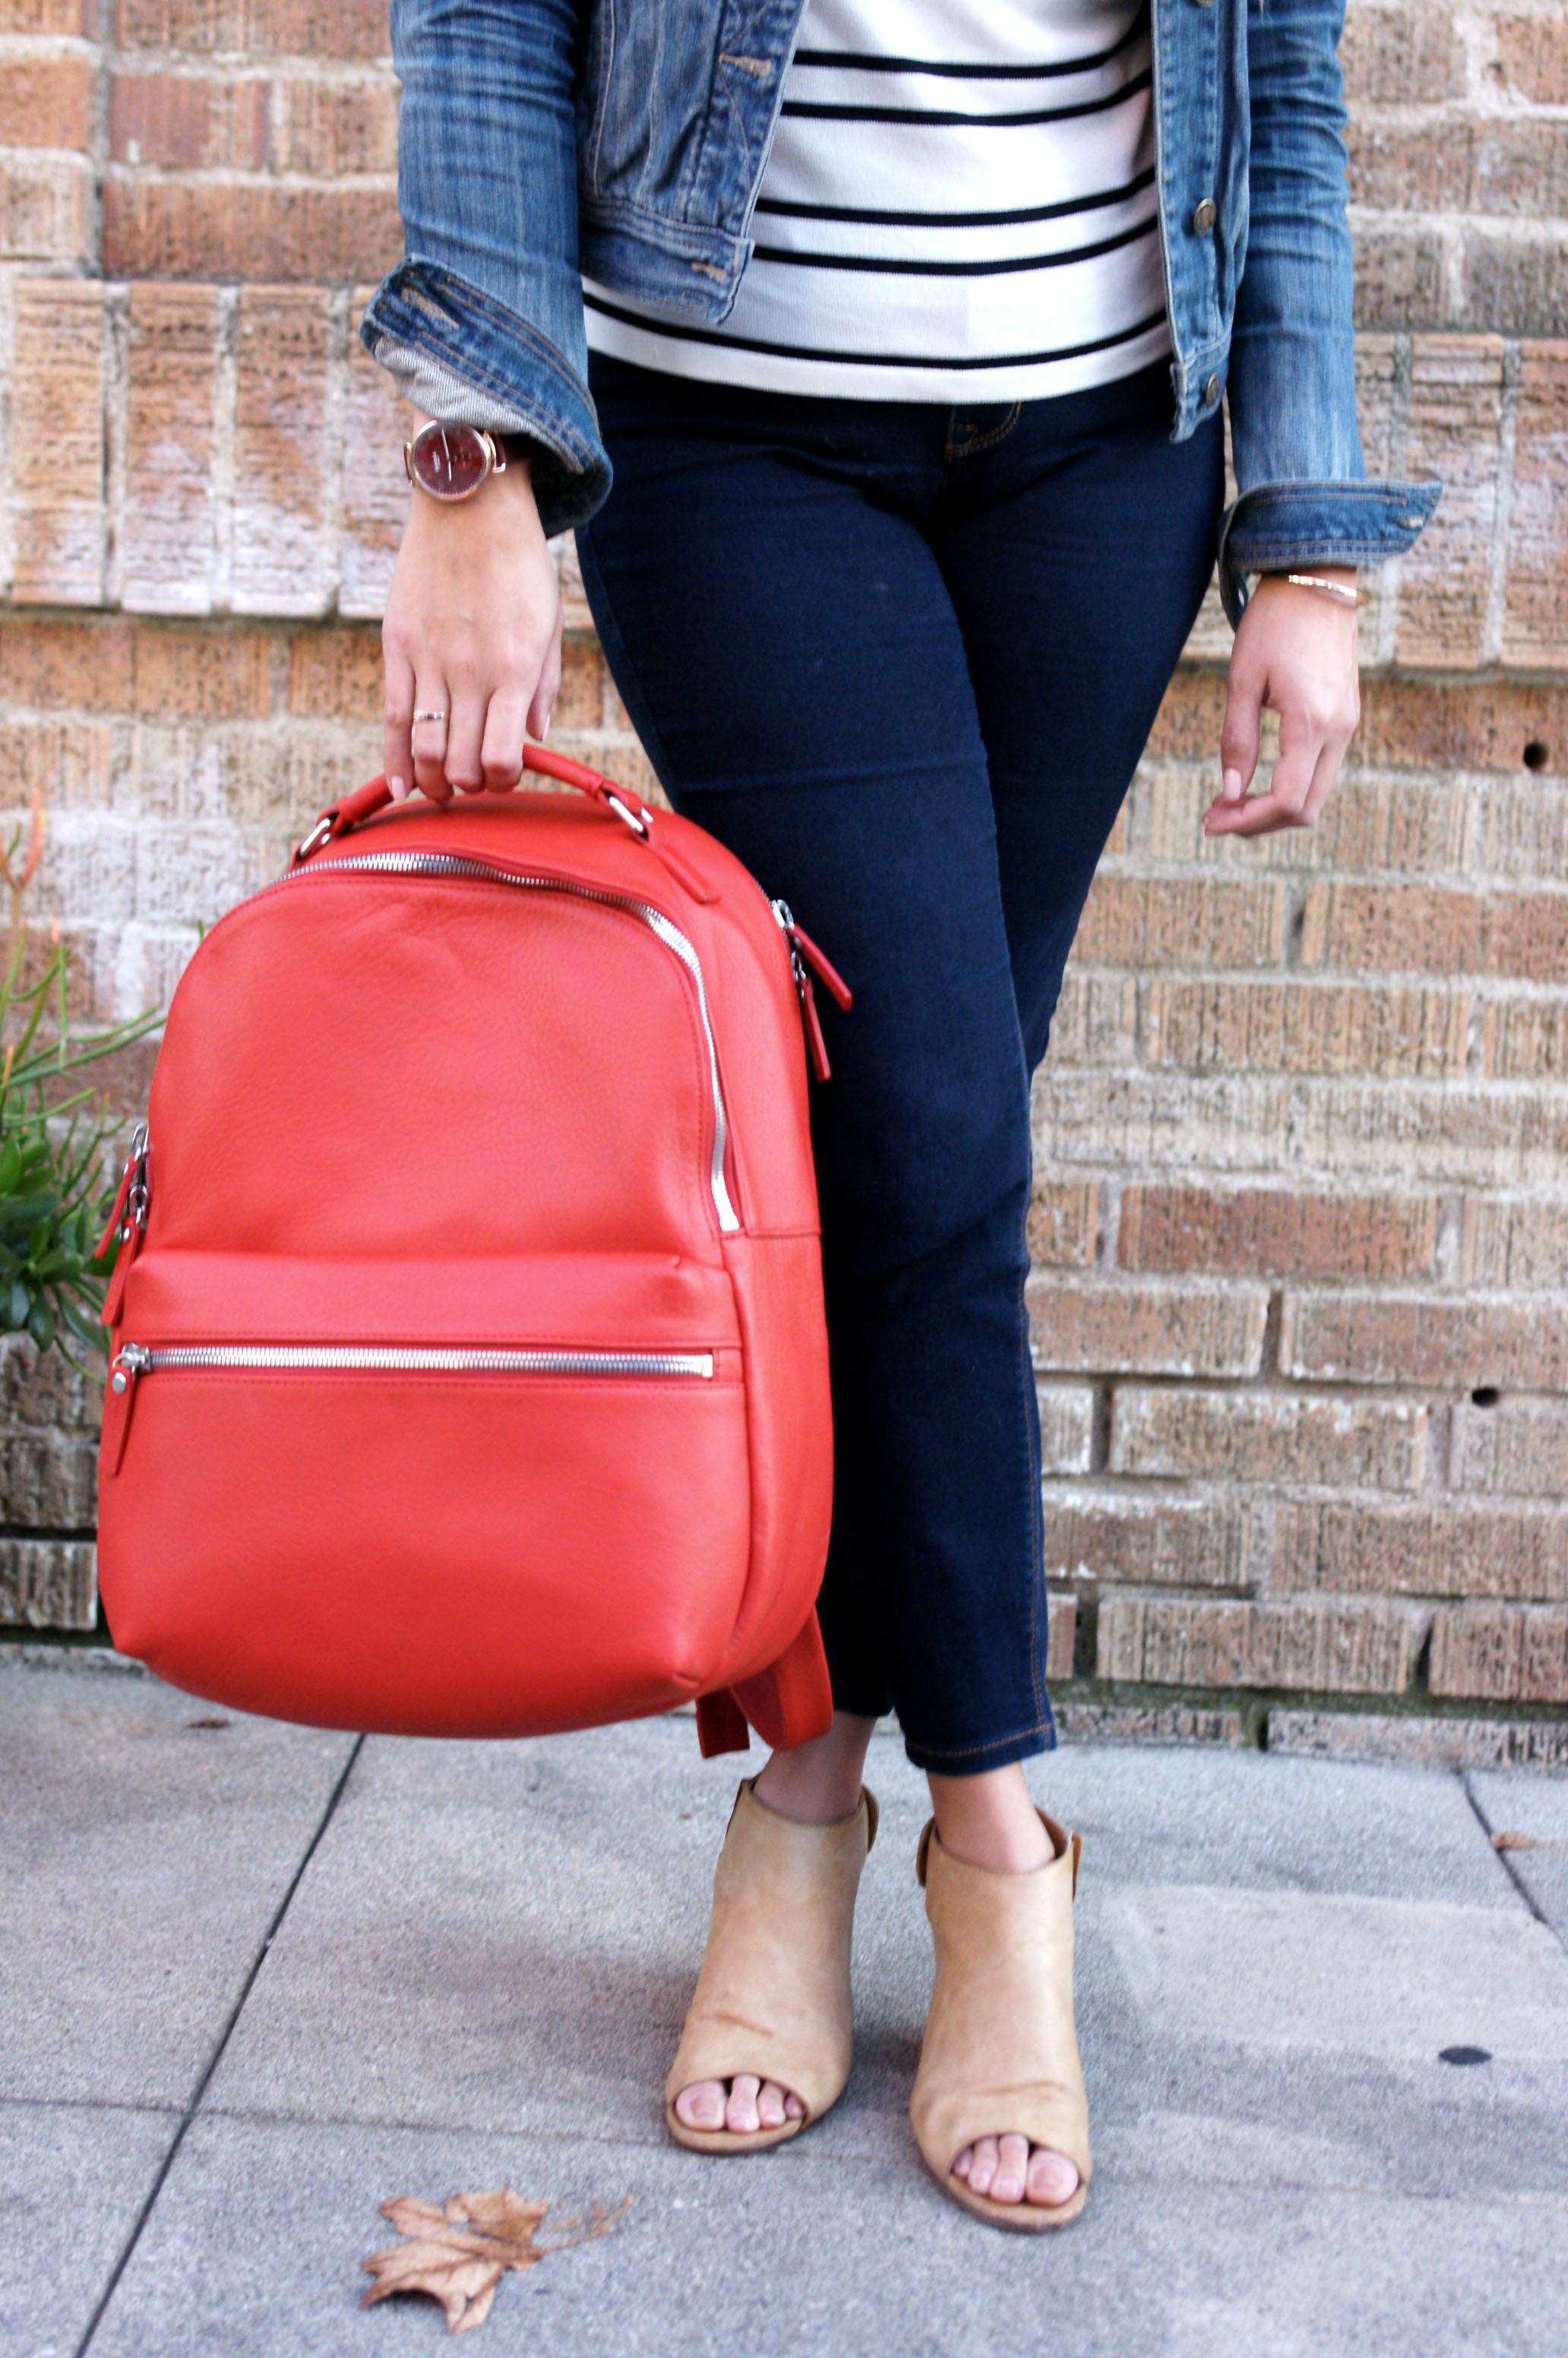 The Runwell Backpack from Shinola